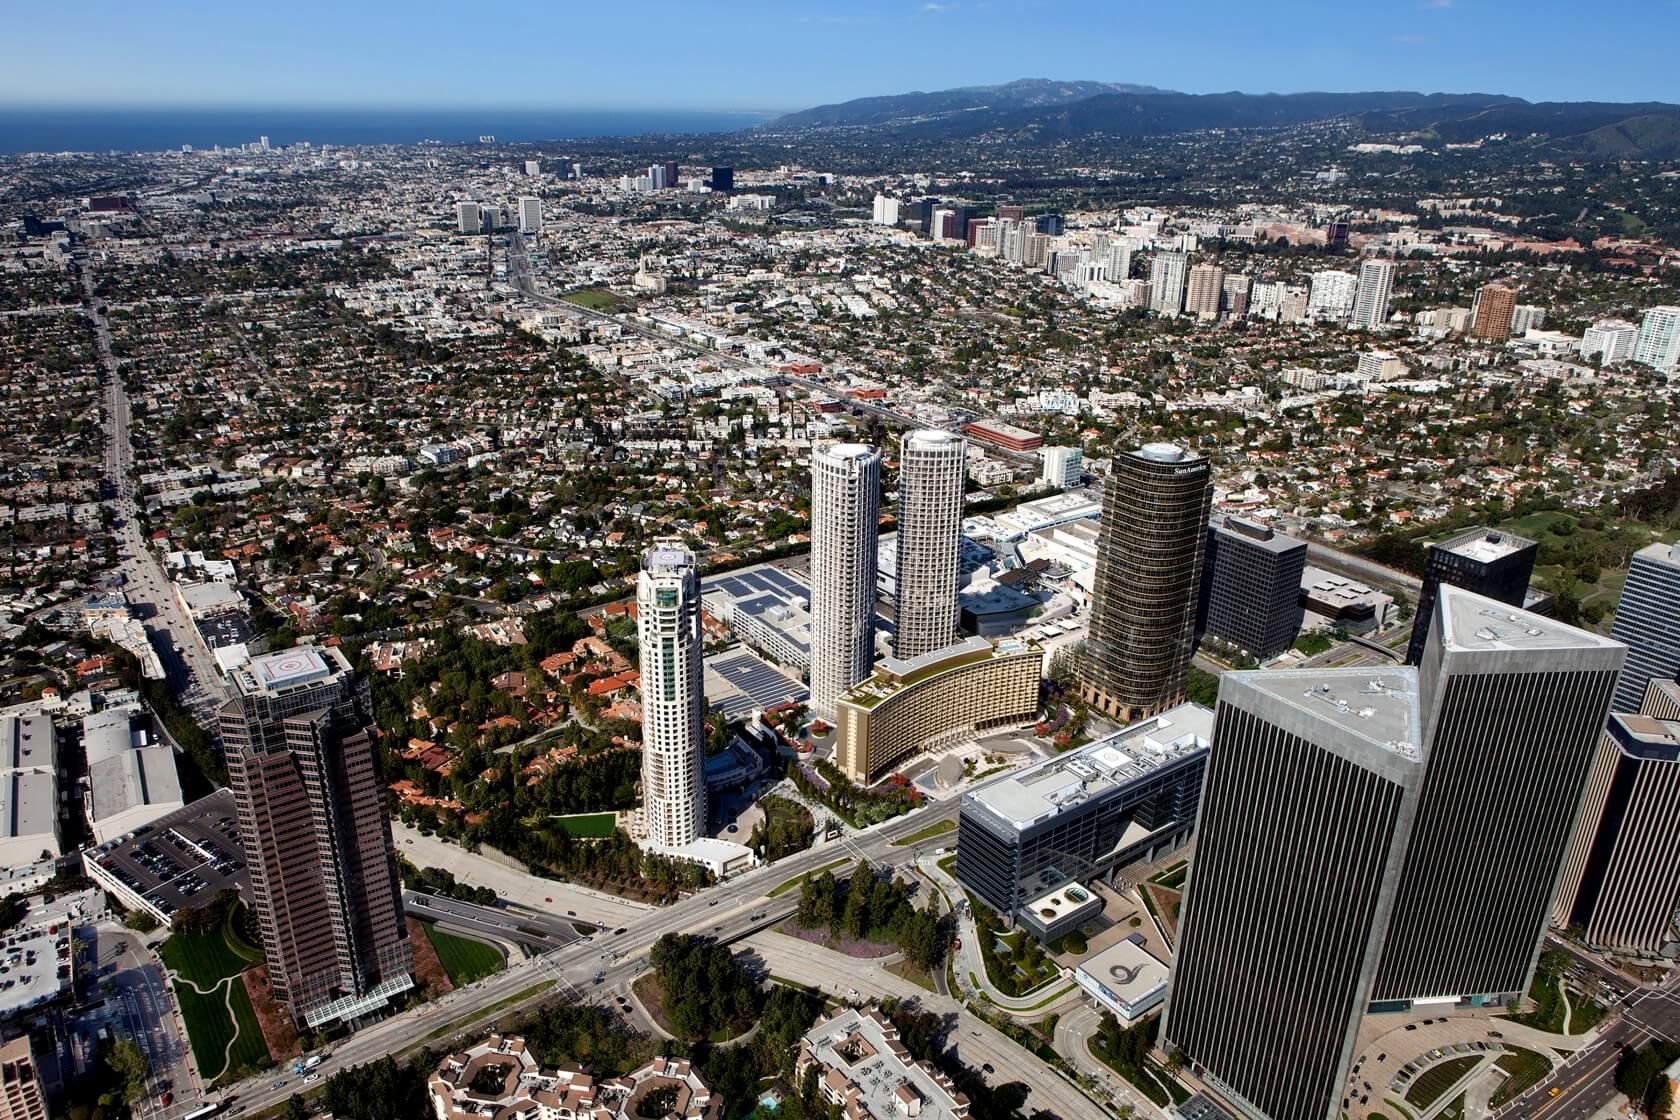 Fairmont Century Plaza Los Angeles has a new culinary team